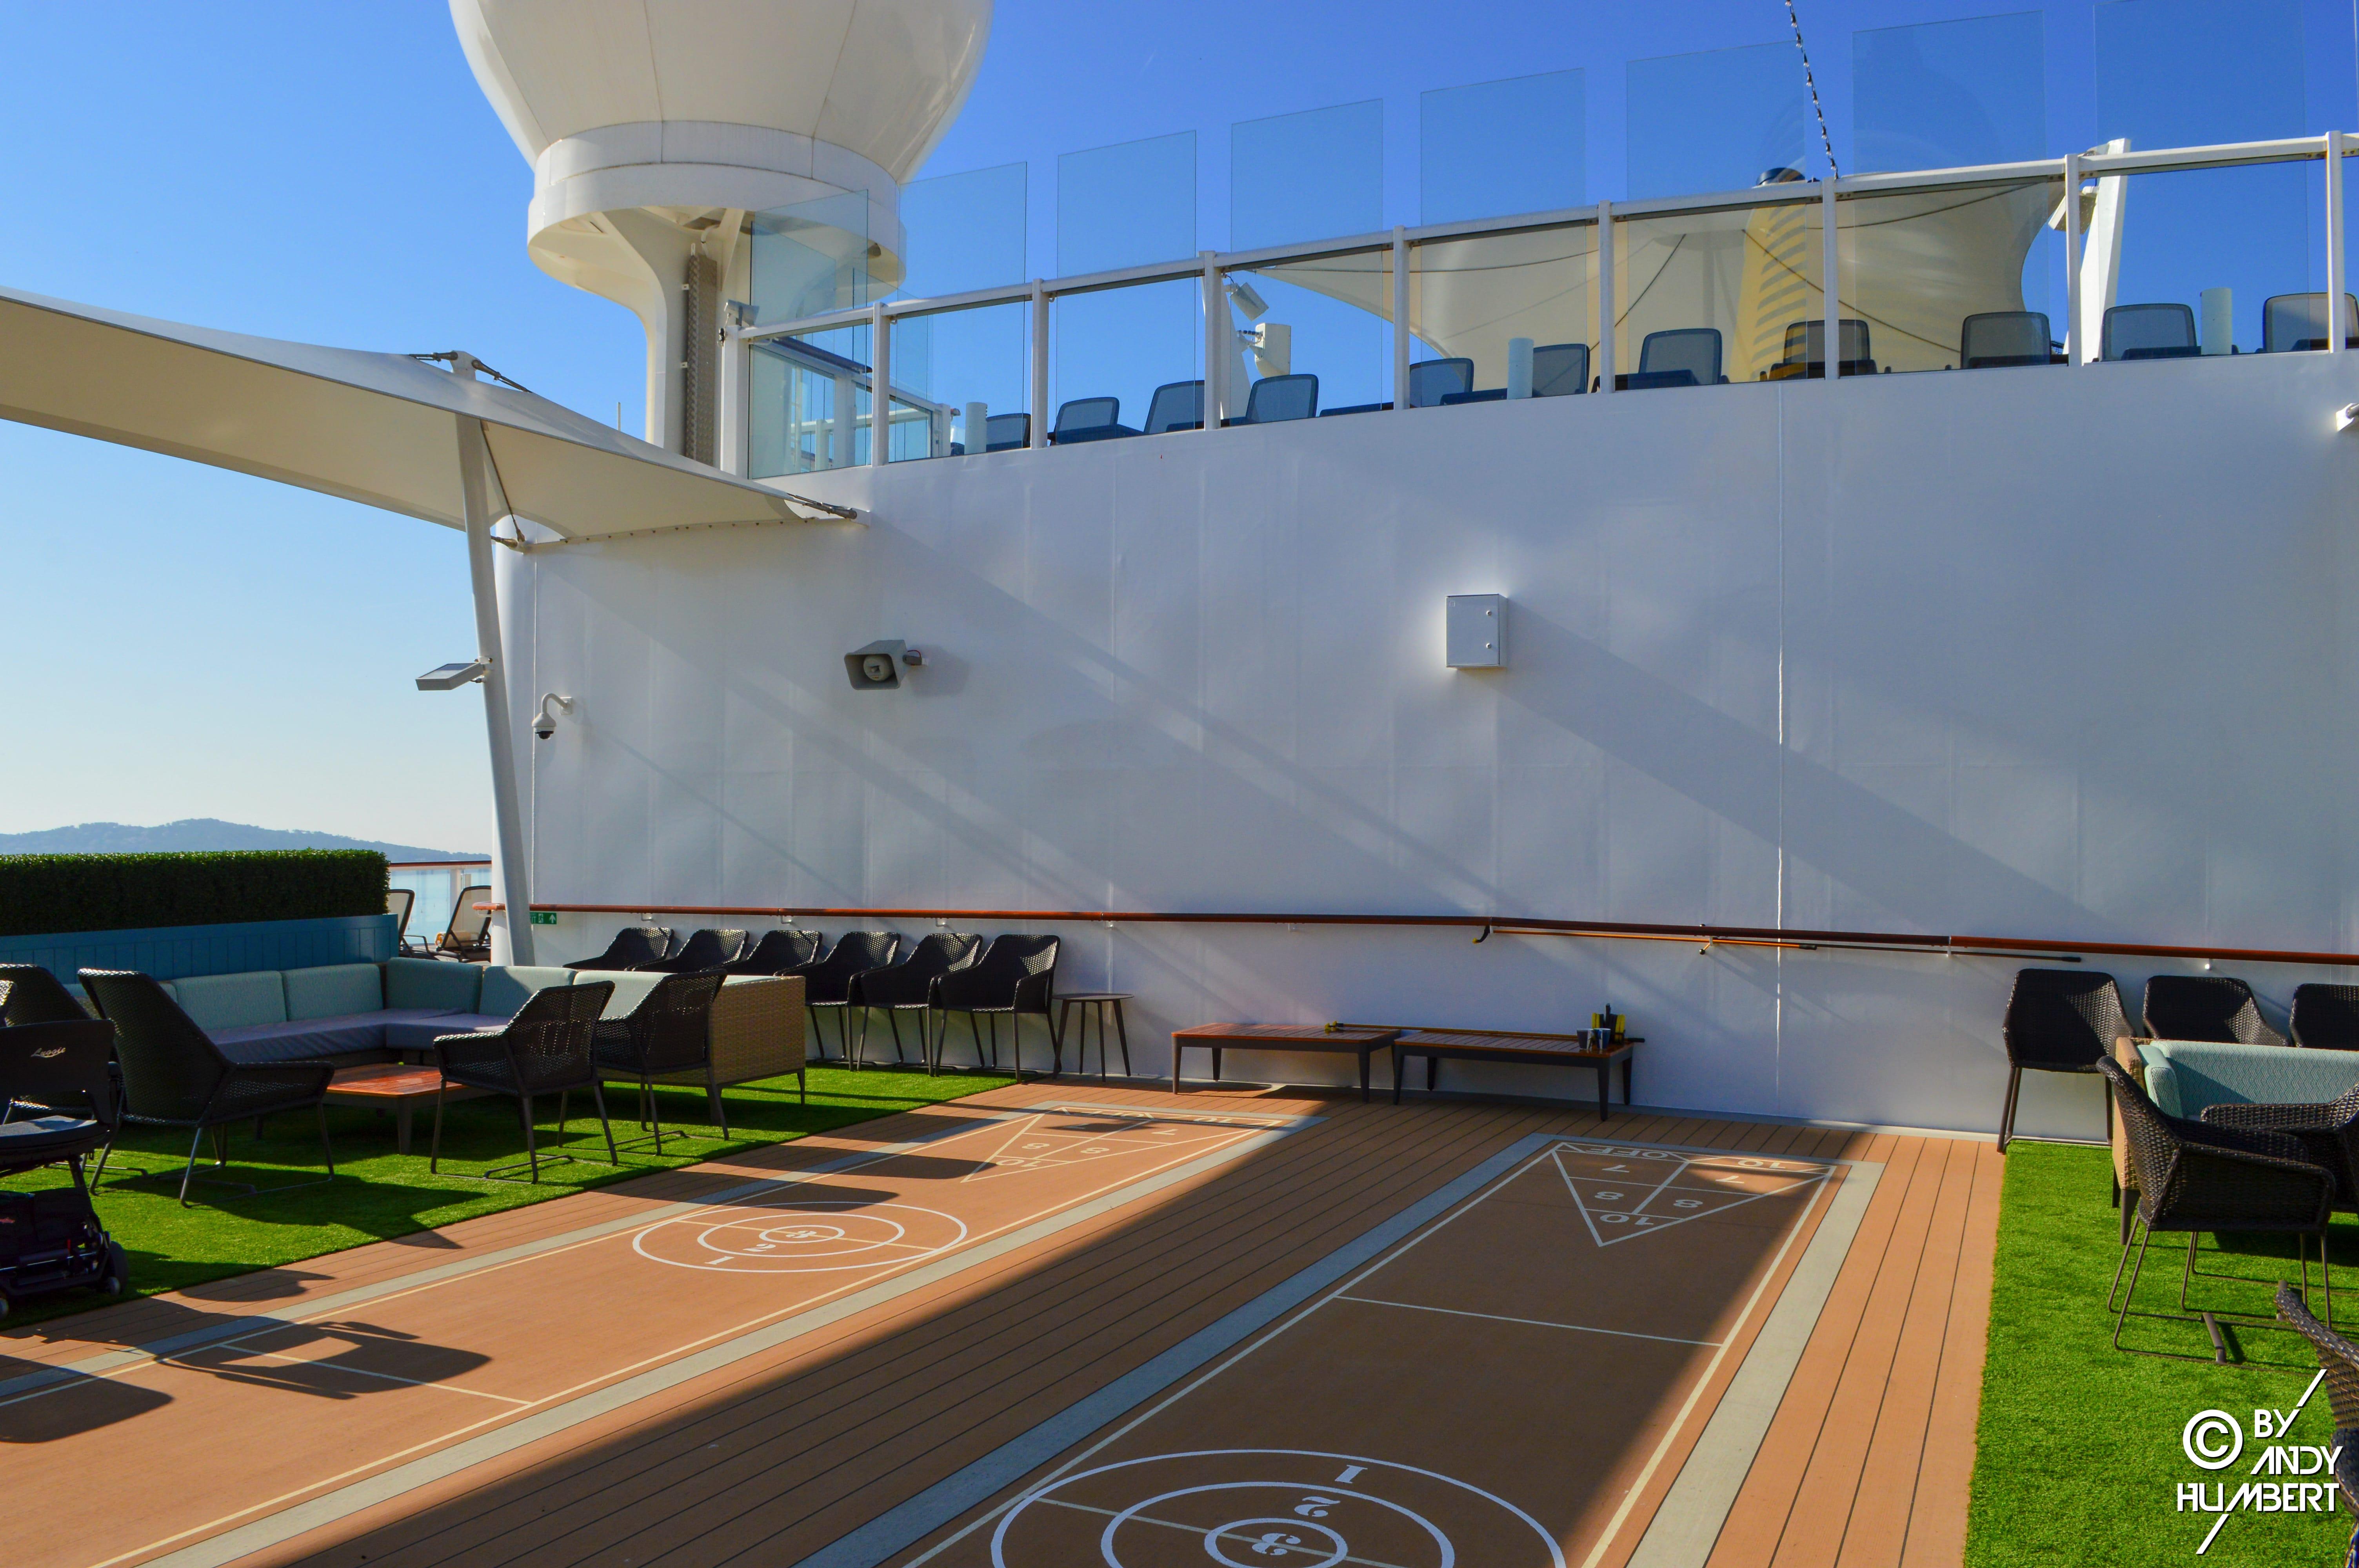 Outdoor Games Area (Sun deck)